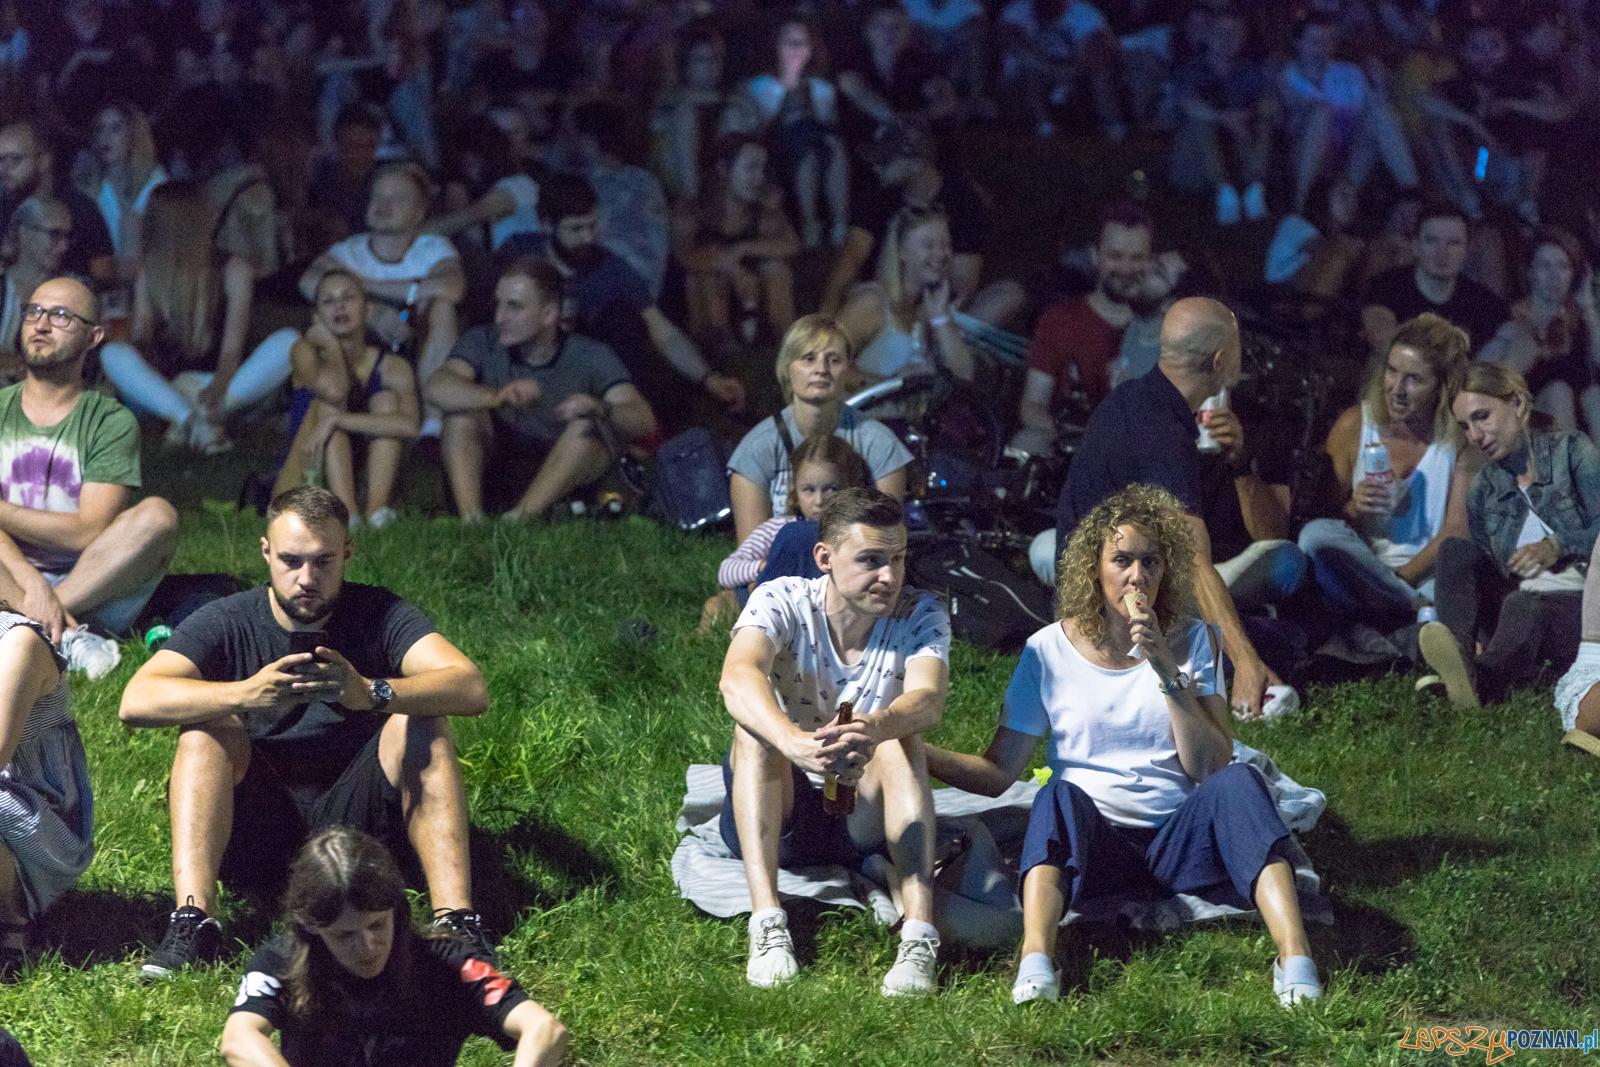 #NaFalach Kam! i Bokka  Foto: lepszyPOZNAN.pl/Piotr Rychter